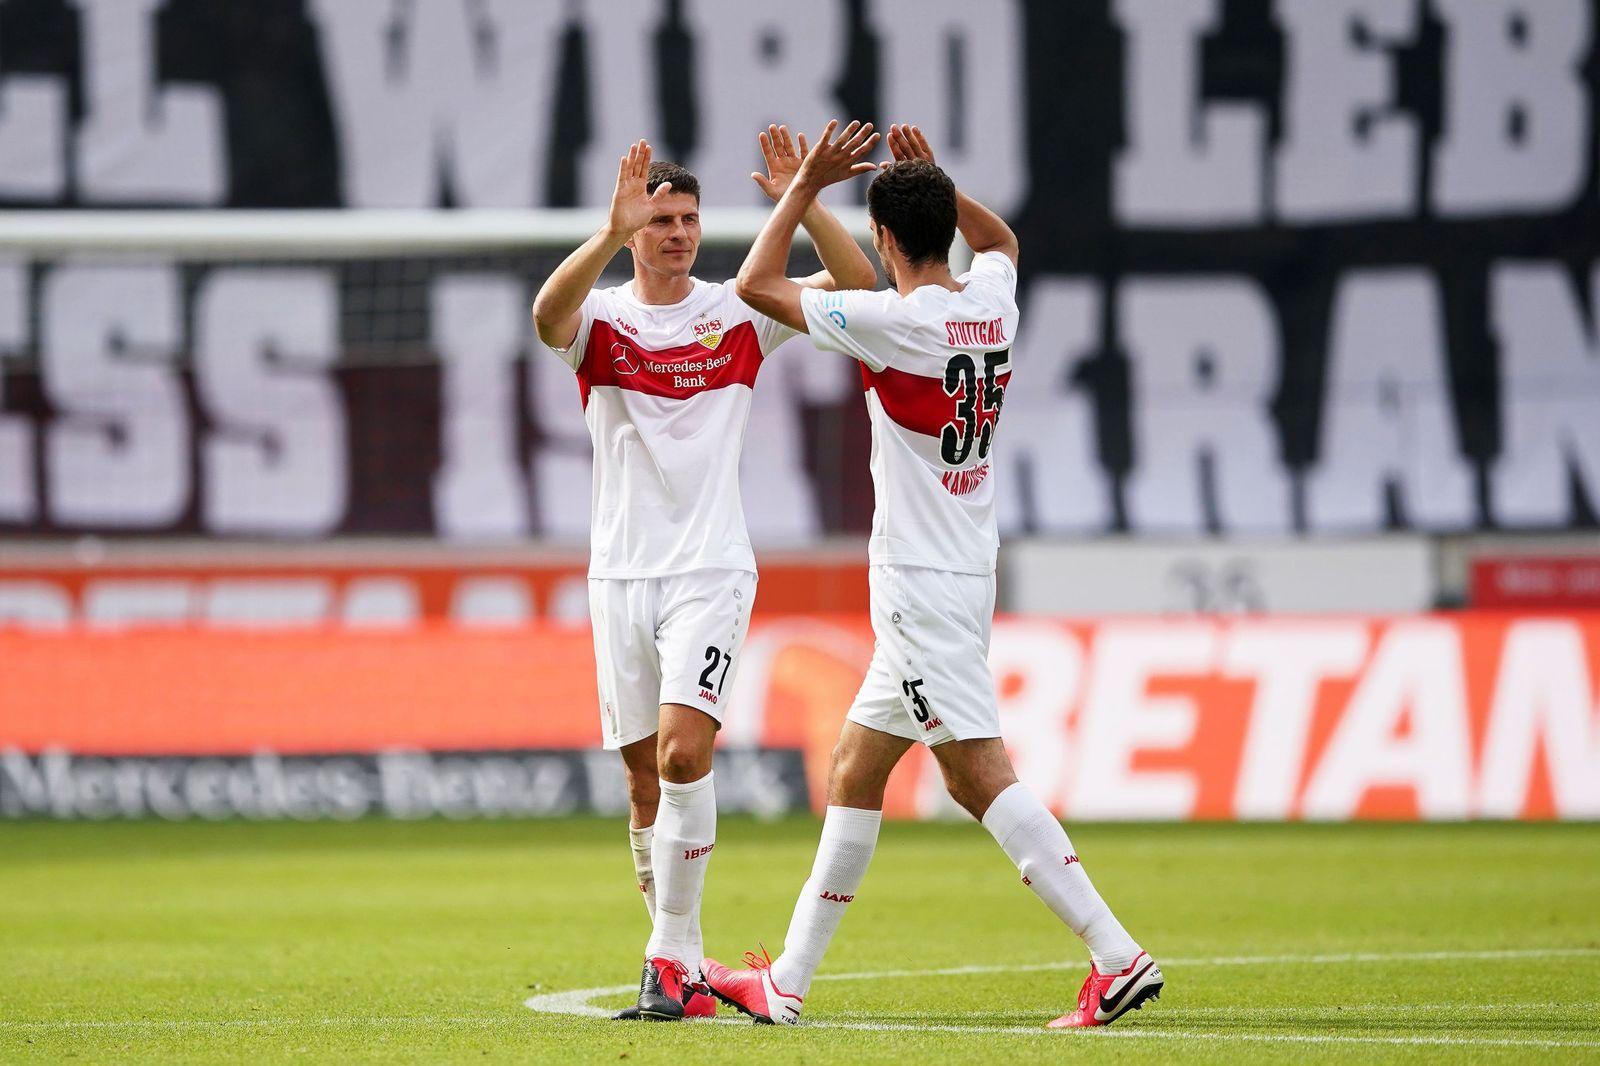 VfB Stuttgart vs SV Darmstadt 98, Germany - 28 Jun 2020